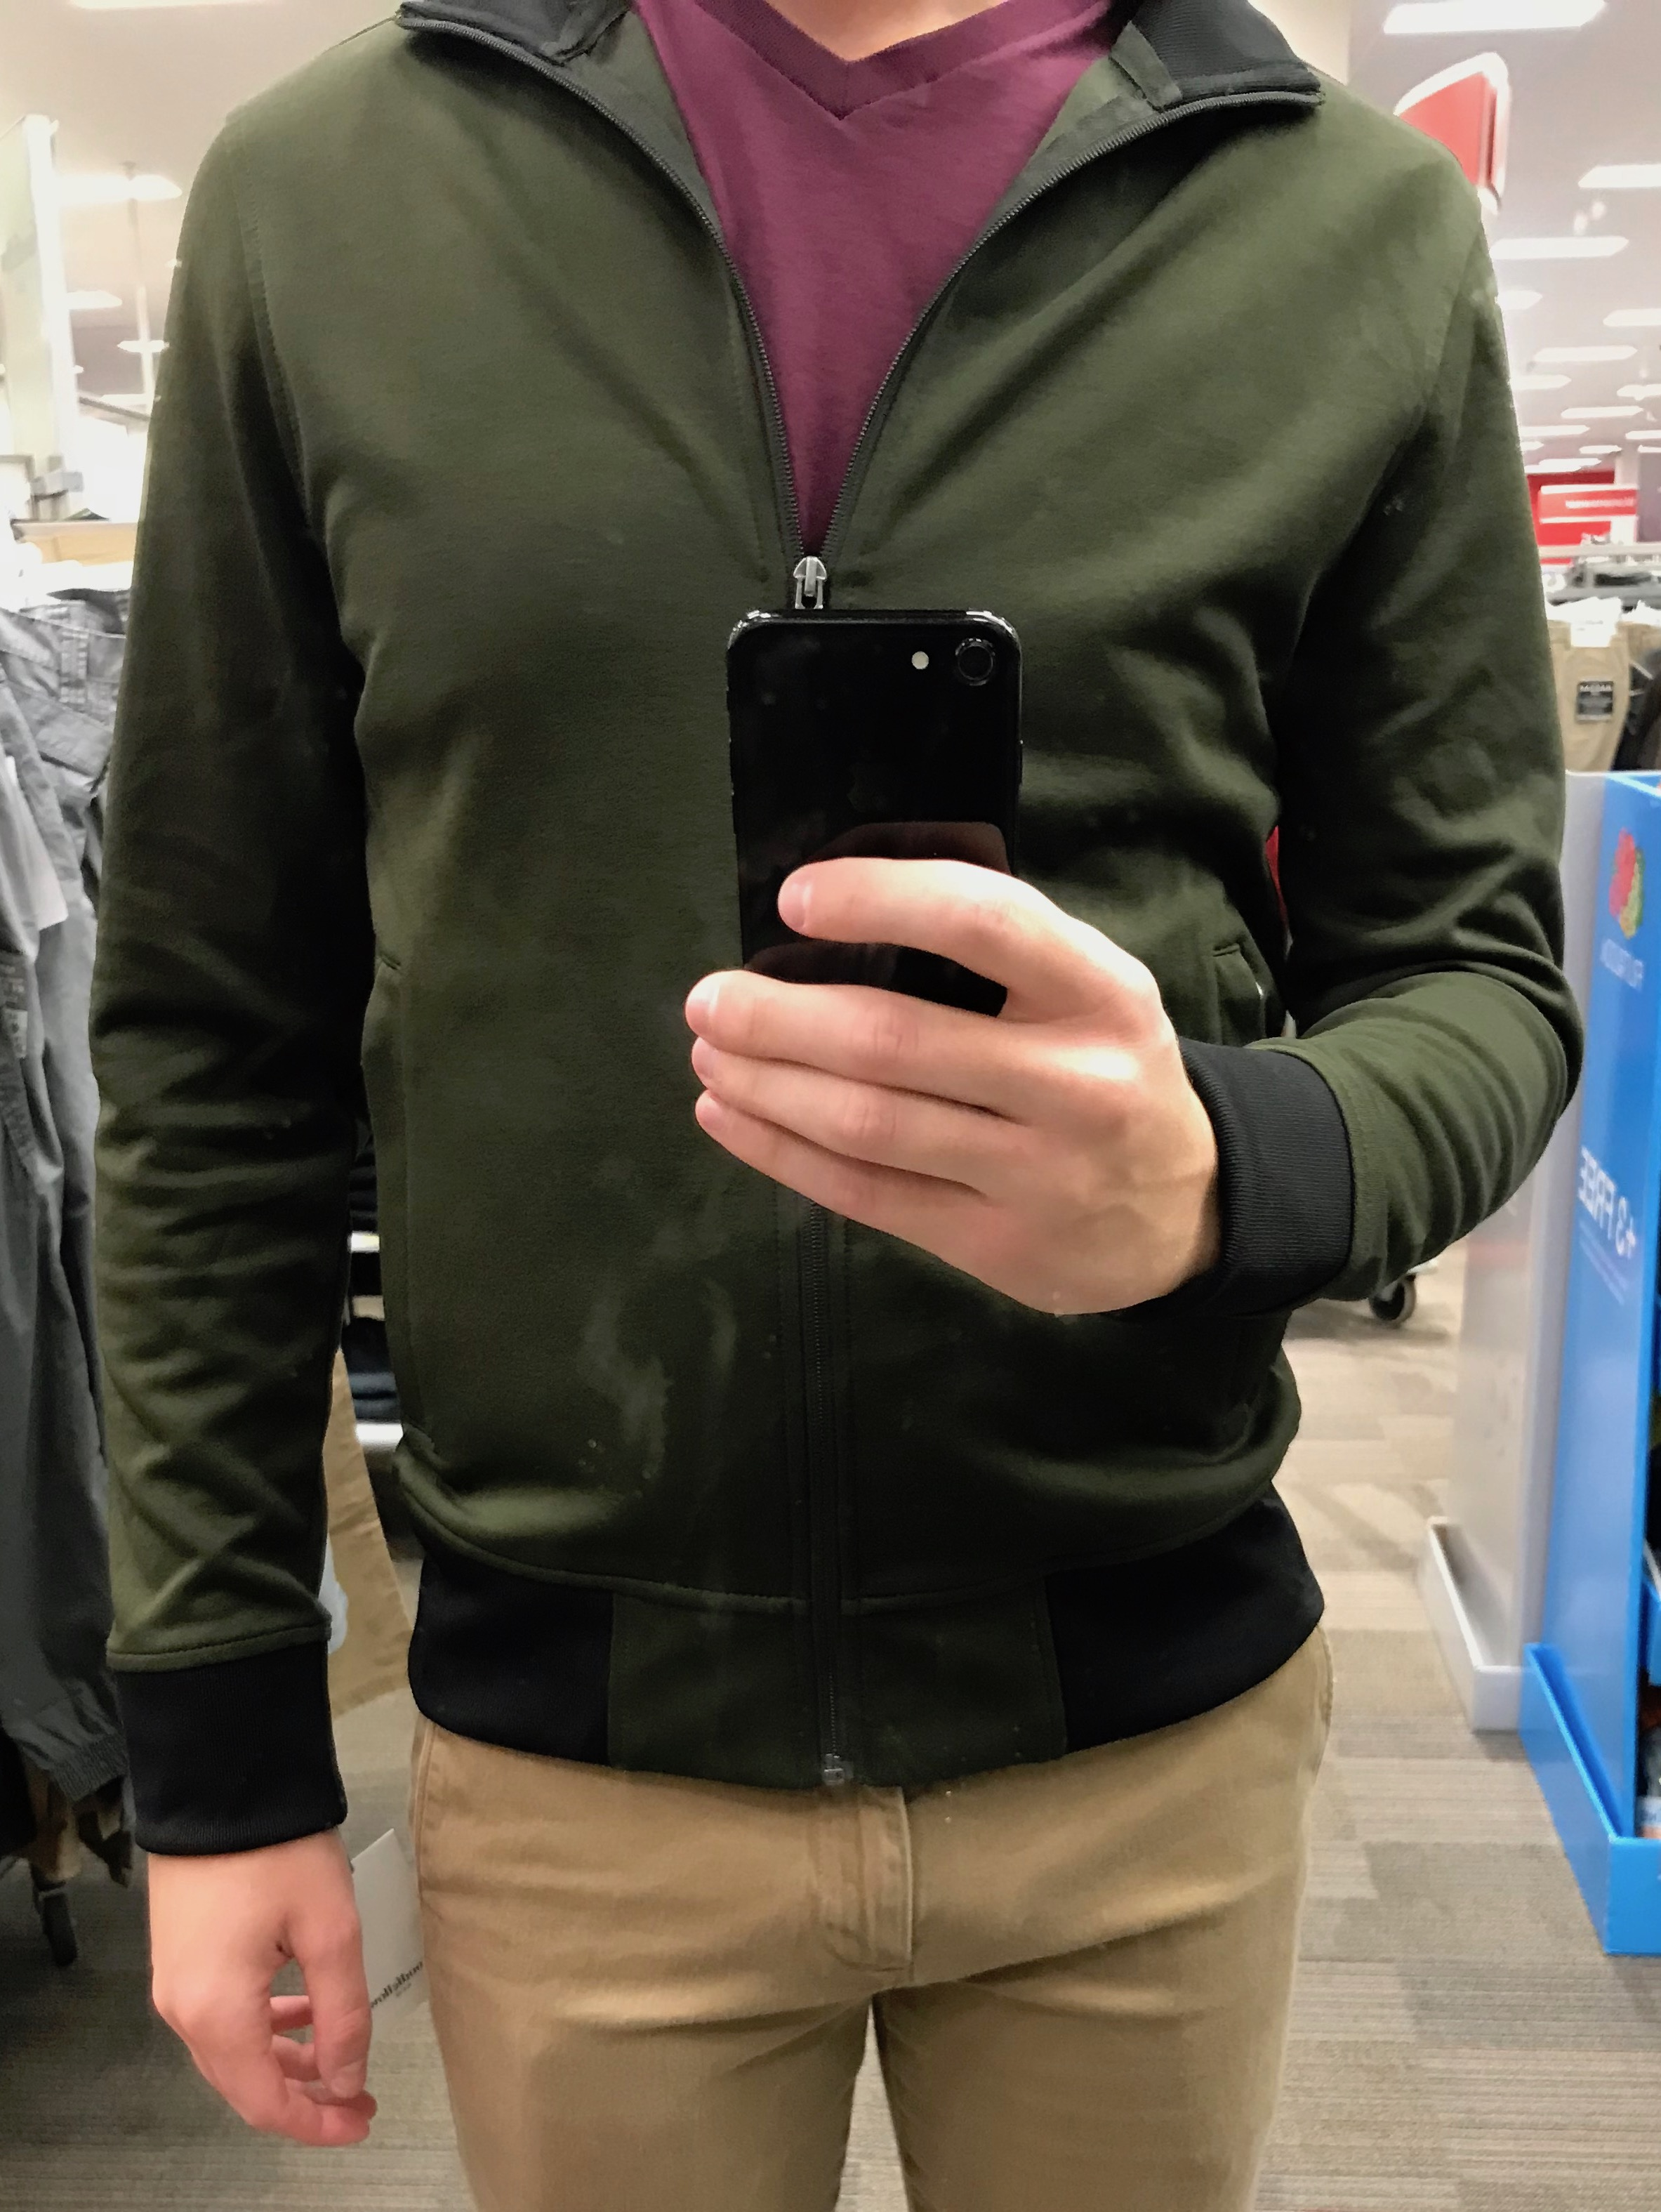 Green Track Jacket - $29.99